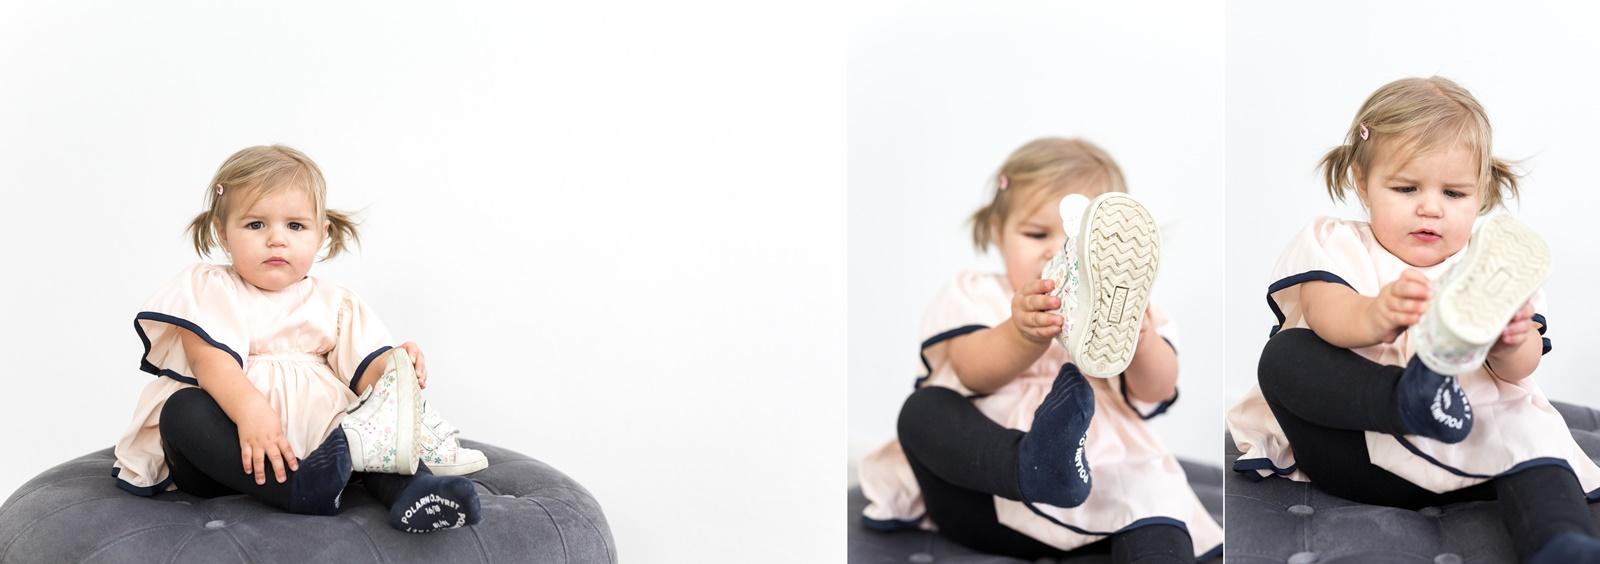 Familjebilder 2018  hos Fröken Foto Malin Richardsson Studio i Skene  (38)-horz 1600.jpg